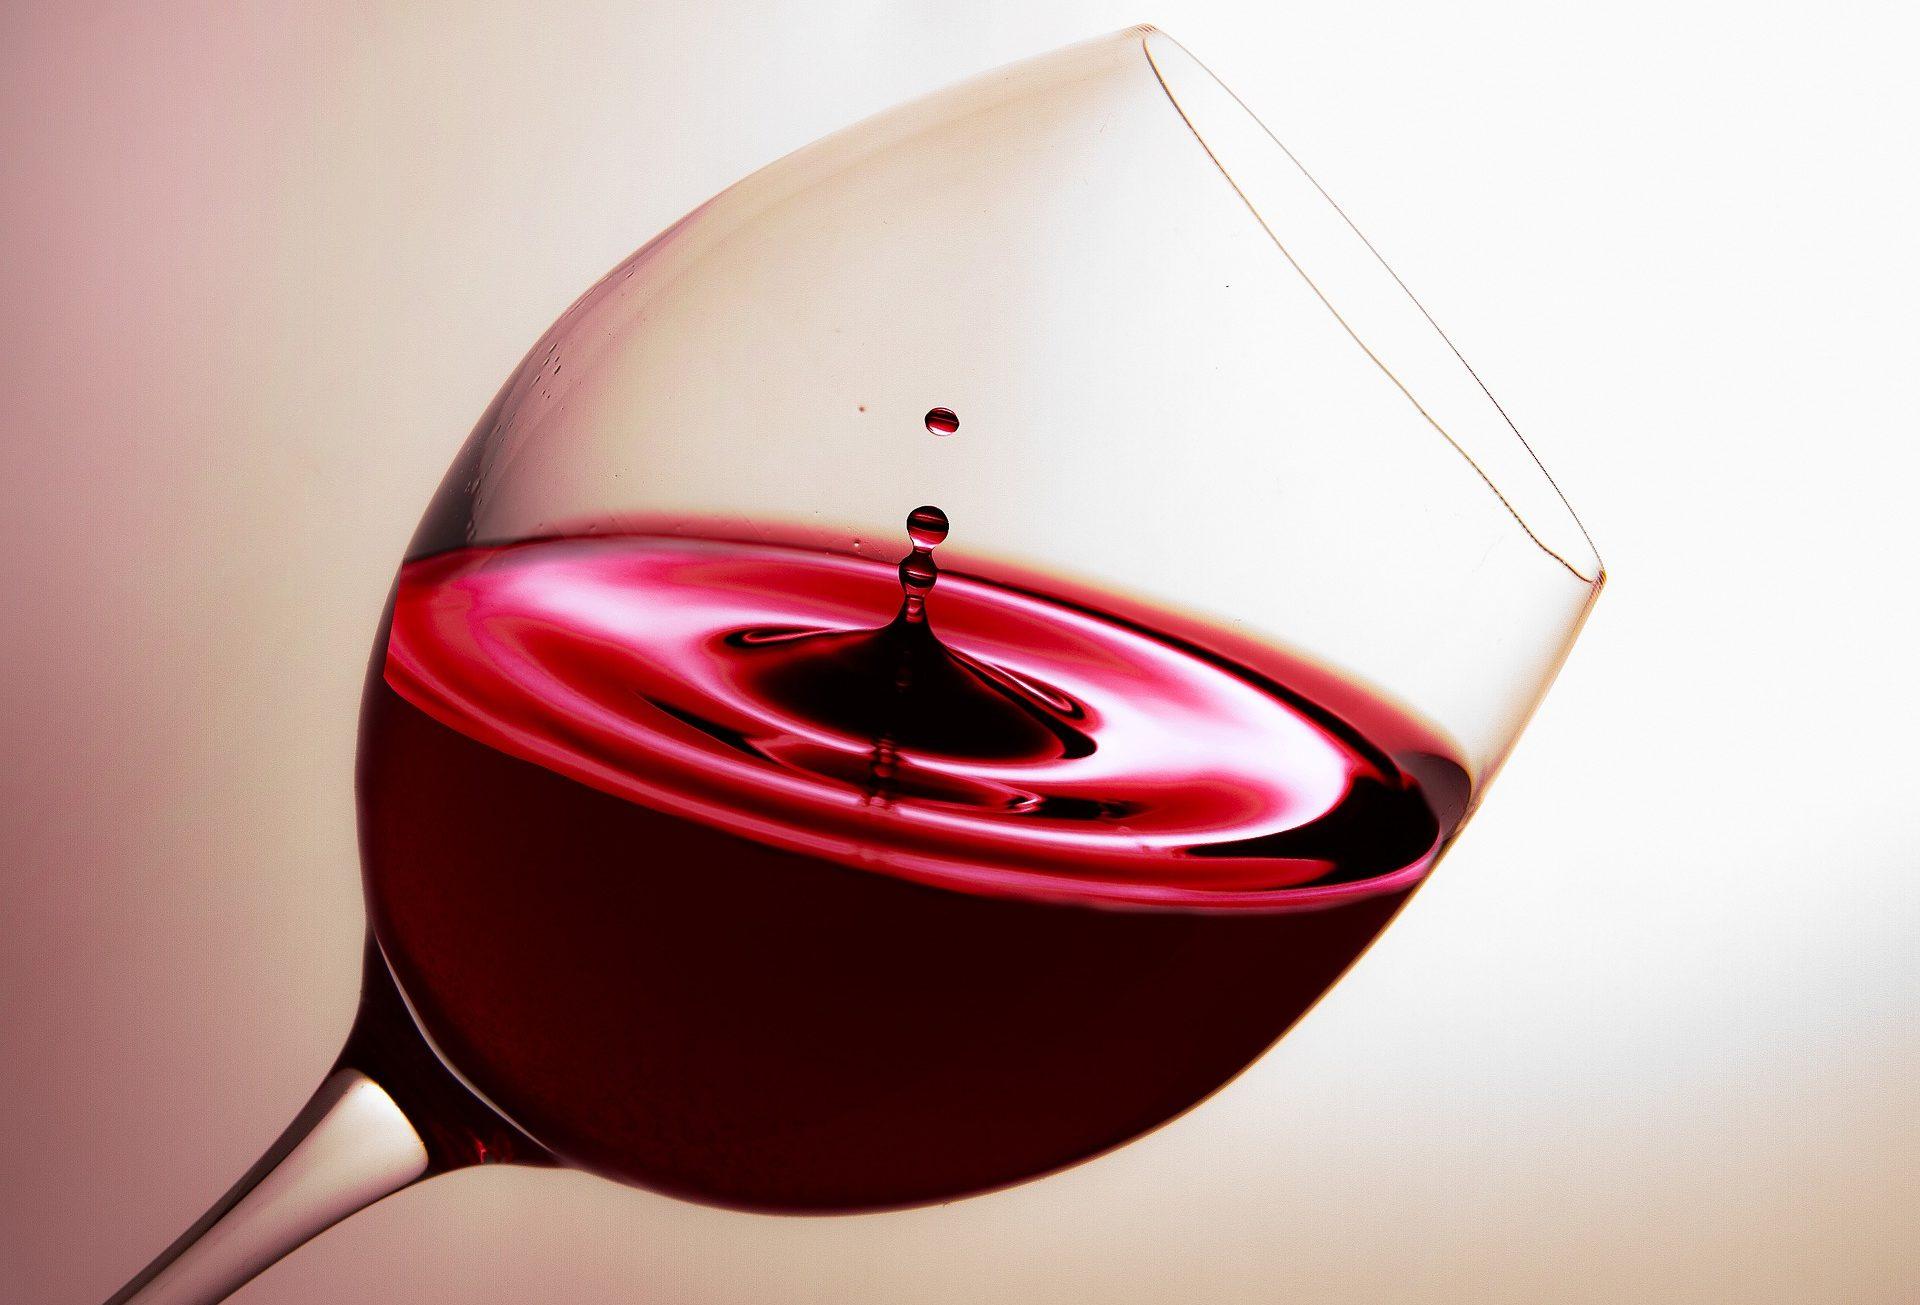 les secrets du vin bge store ludivine crammer